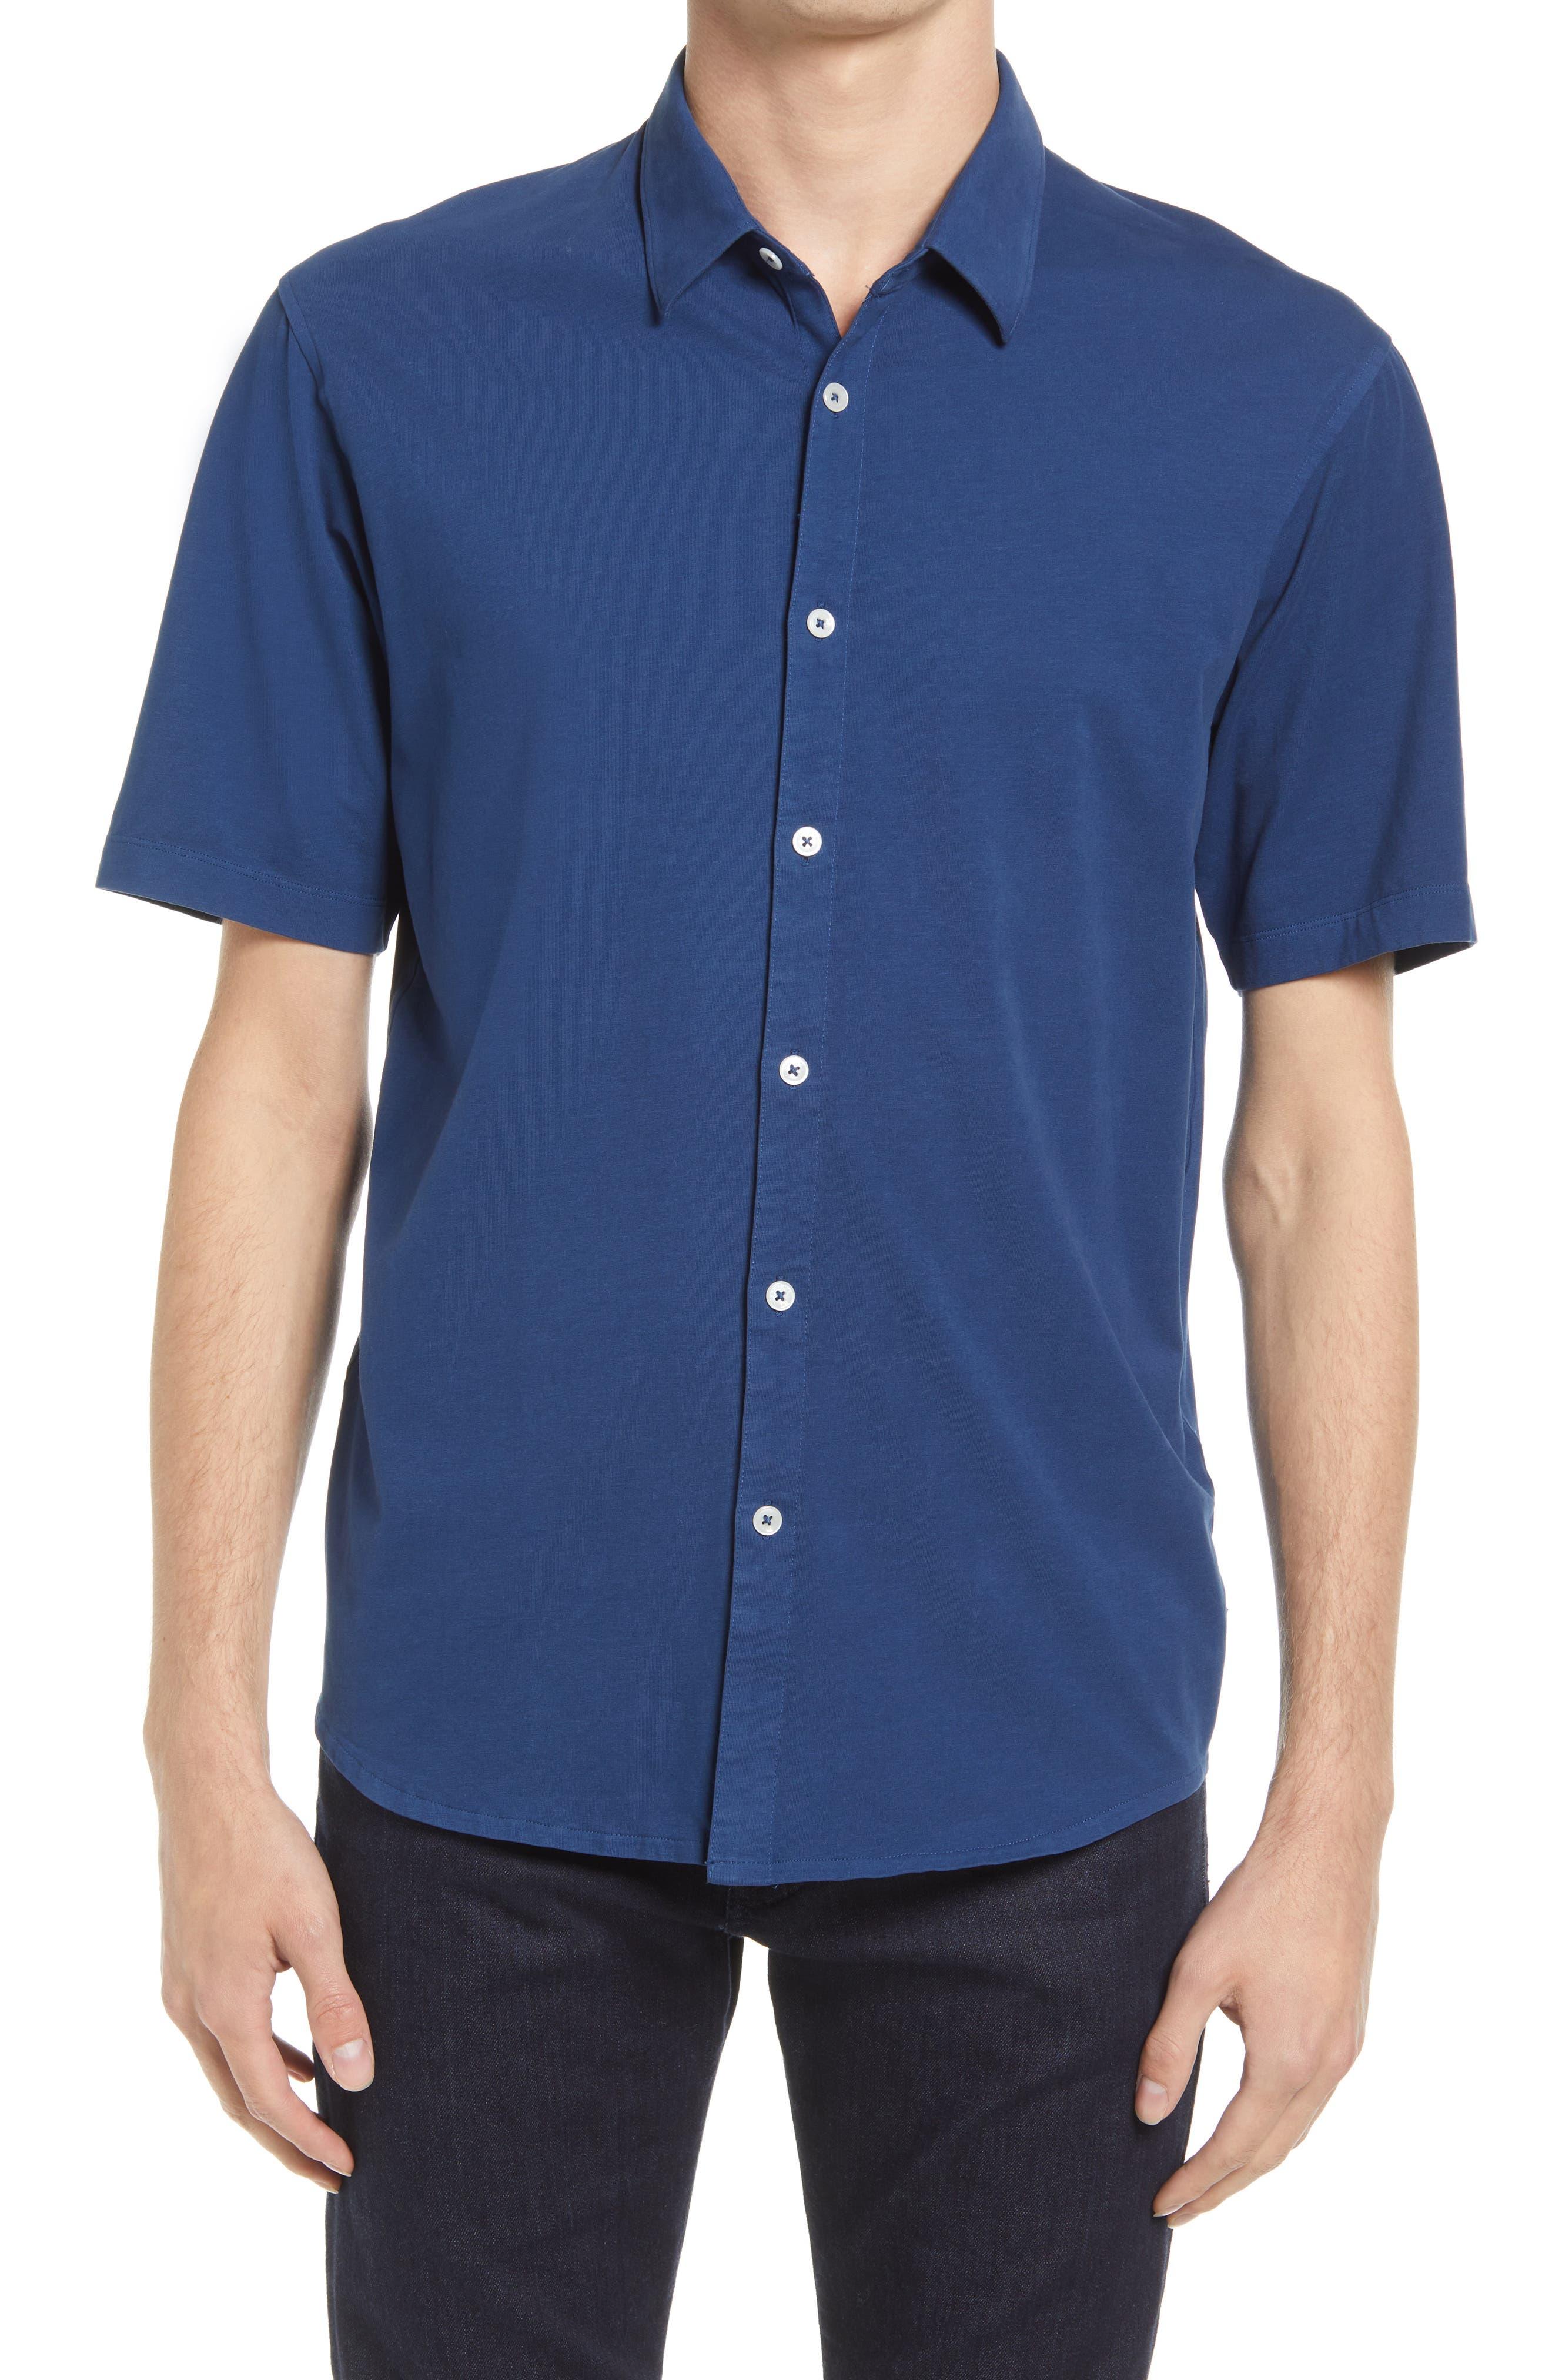 On Point Flex Pro Lite Slim Fit Button-Up Shirt